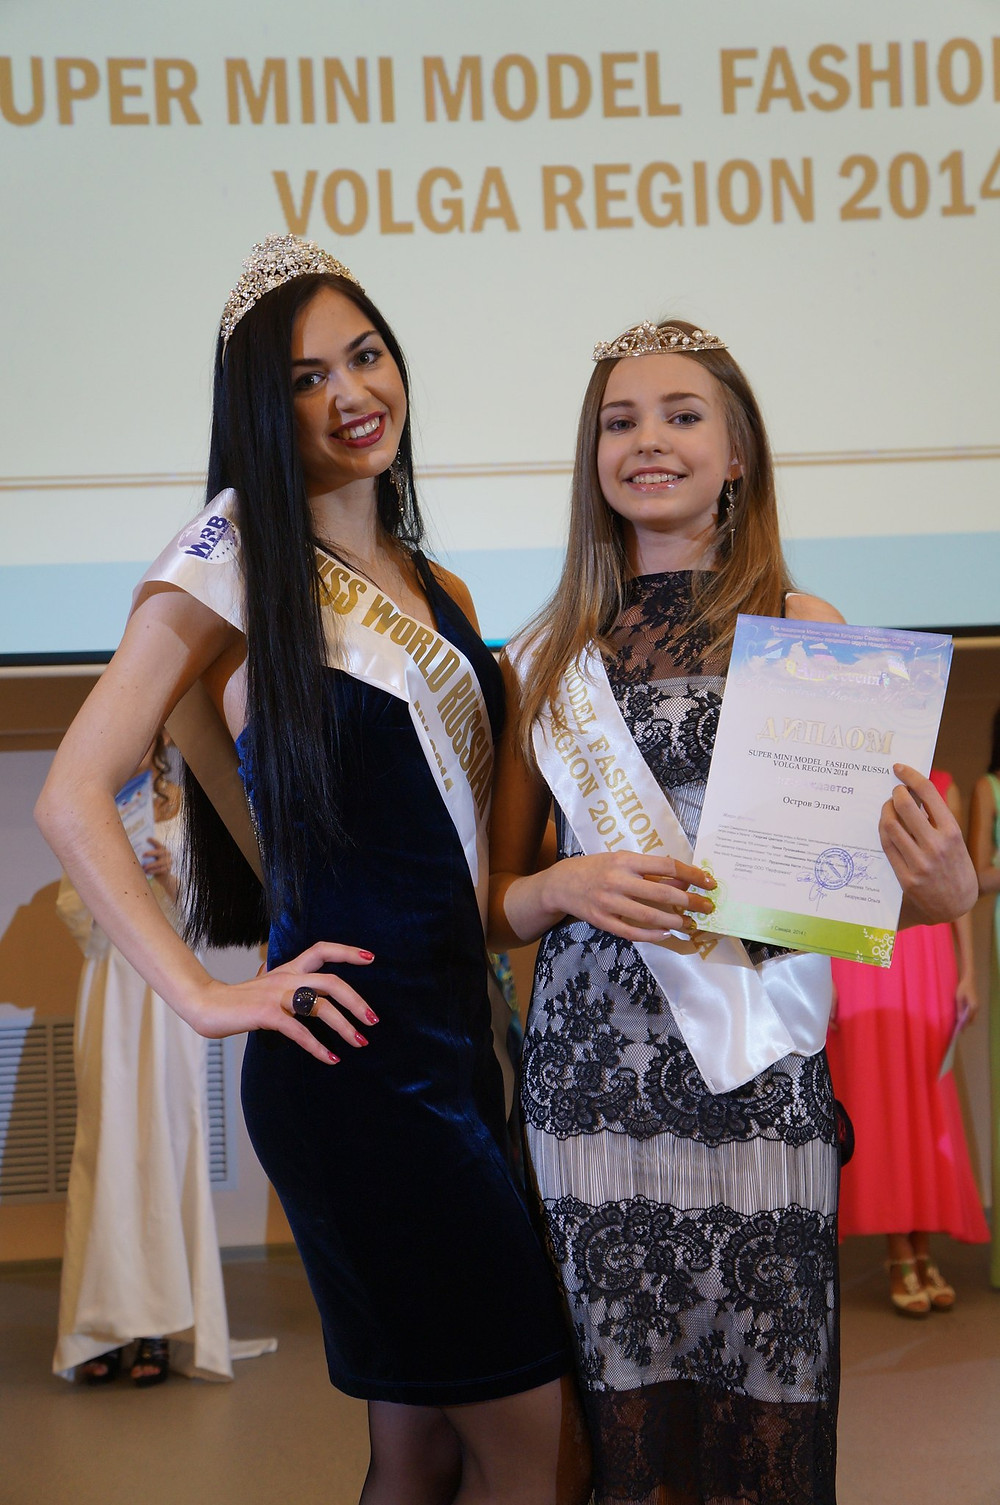 Элика Остров - Super Mini Model Fashion Russia Volga Region